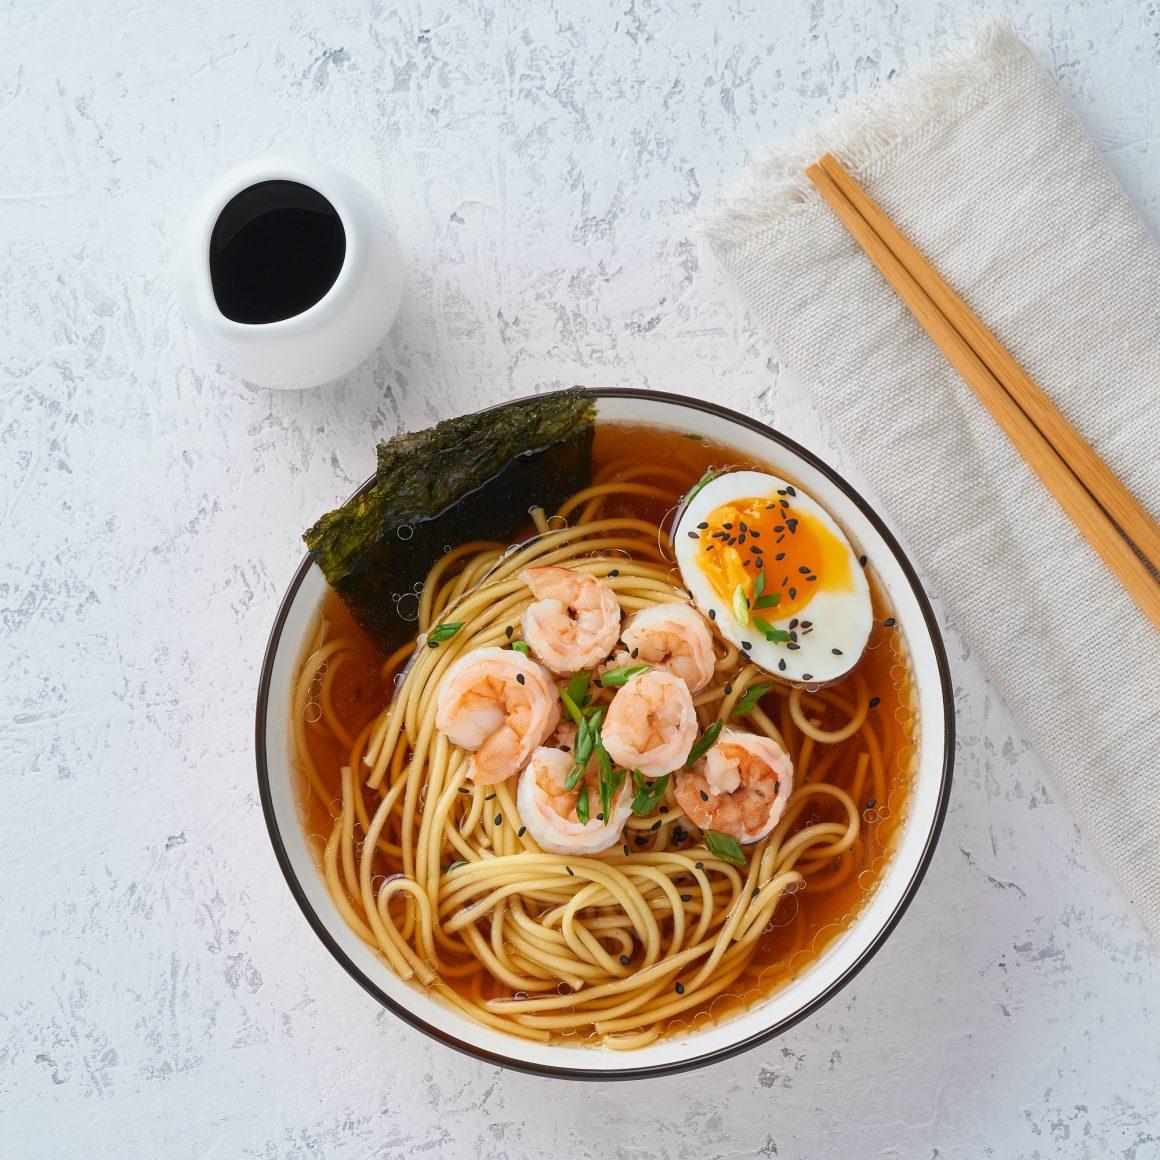 Asian soup with noodles, ramen with shrimps. Healthy Junk Food